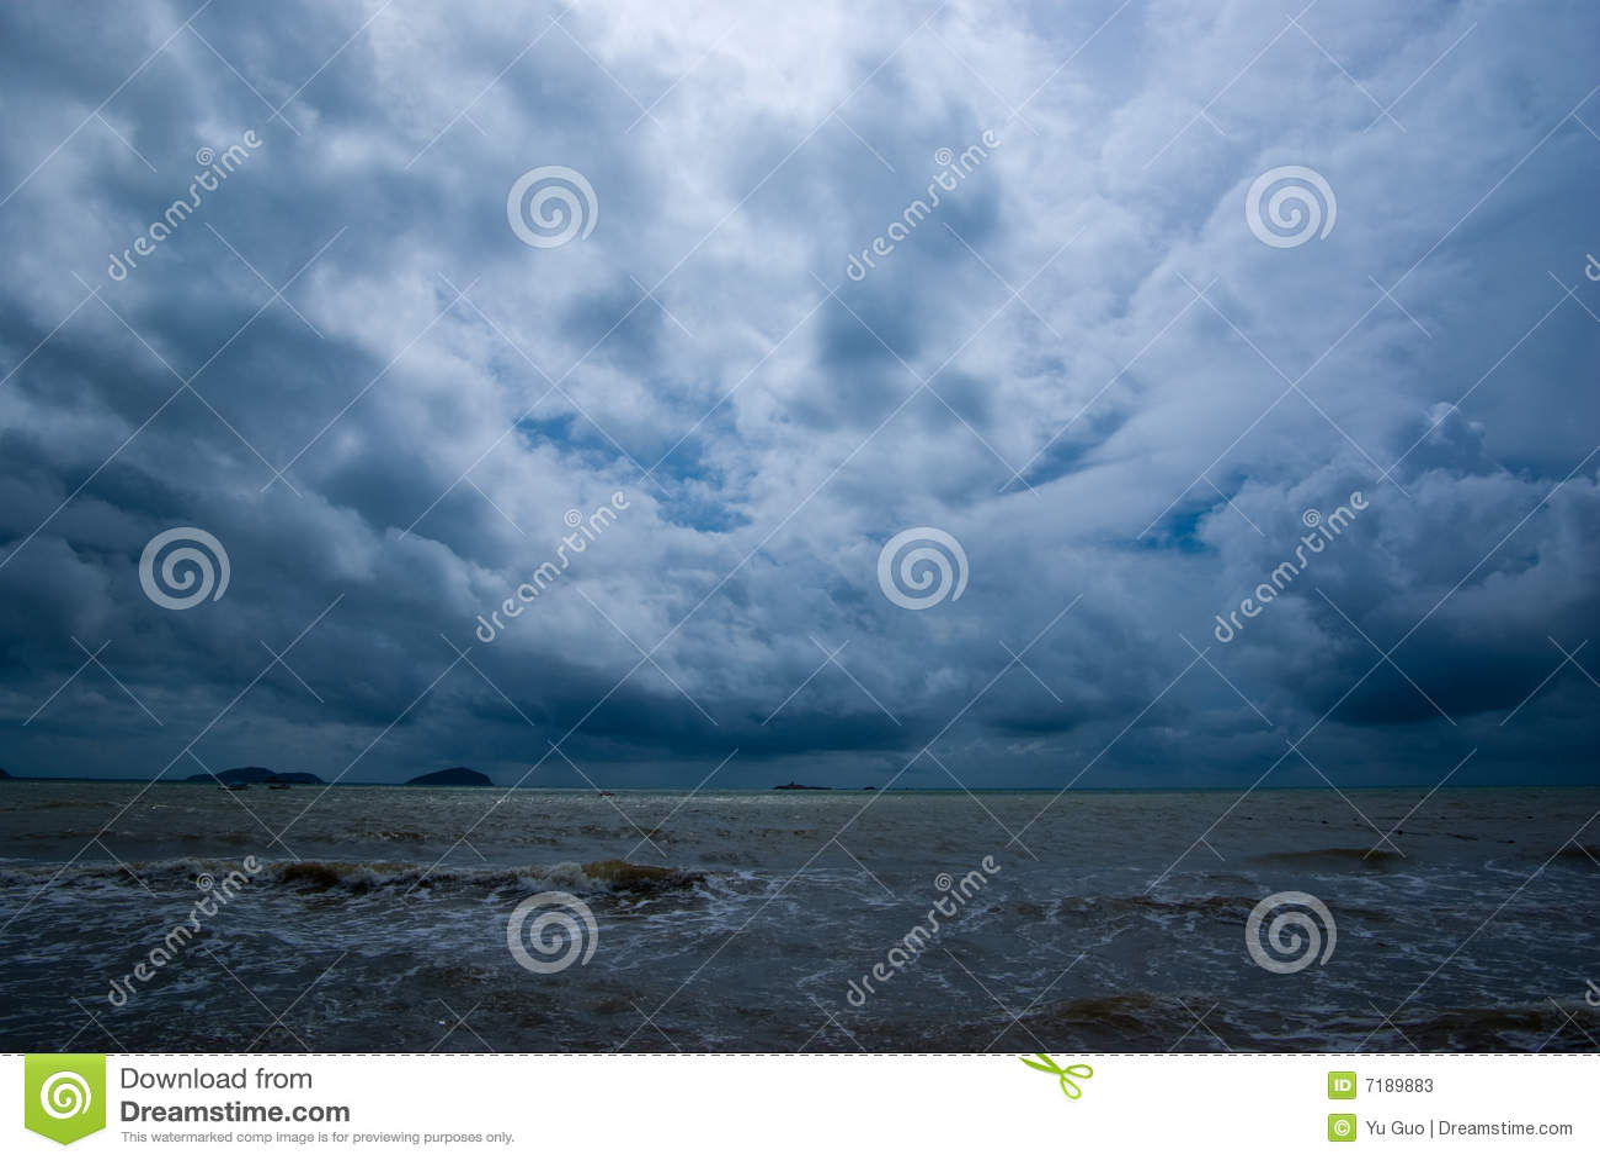 Dark clouds coming